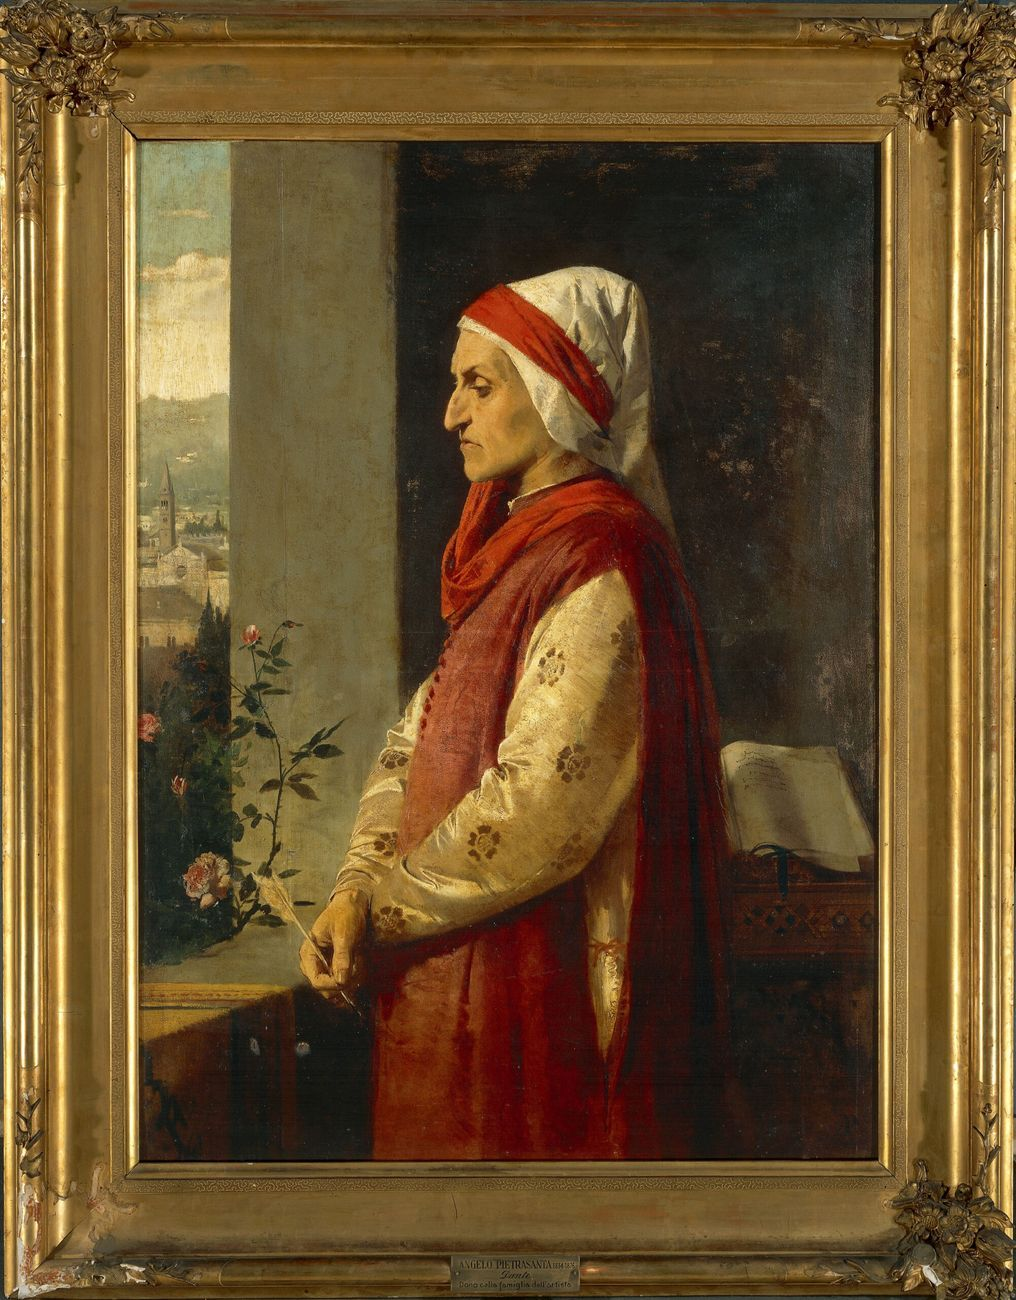 Angelo Pietrasanta, Ritratto di Dante Alighieri © Veneranda Biblioteca Ambrosiana - Mondadori Portfolio